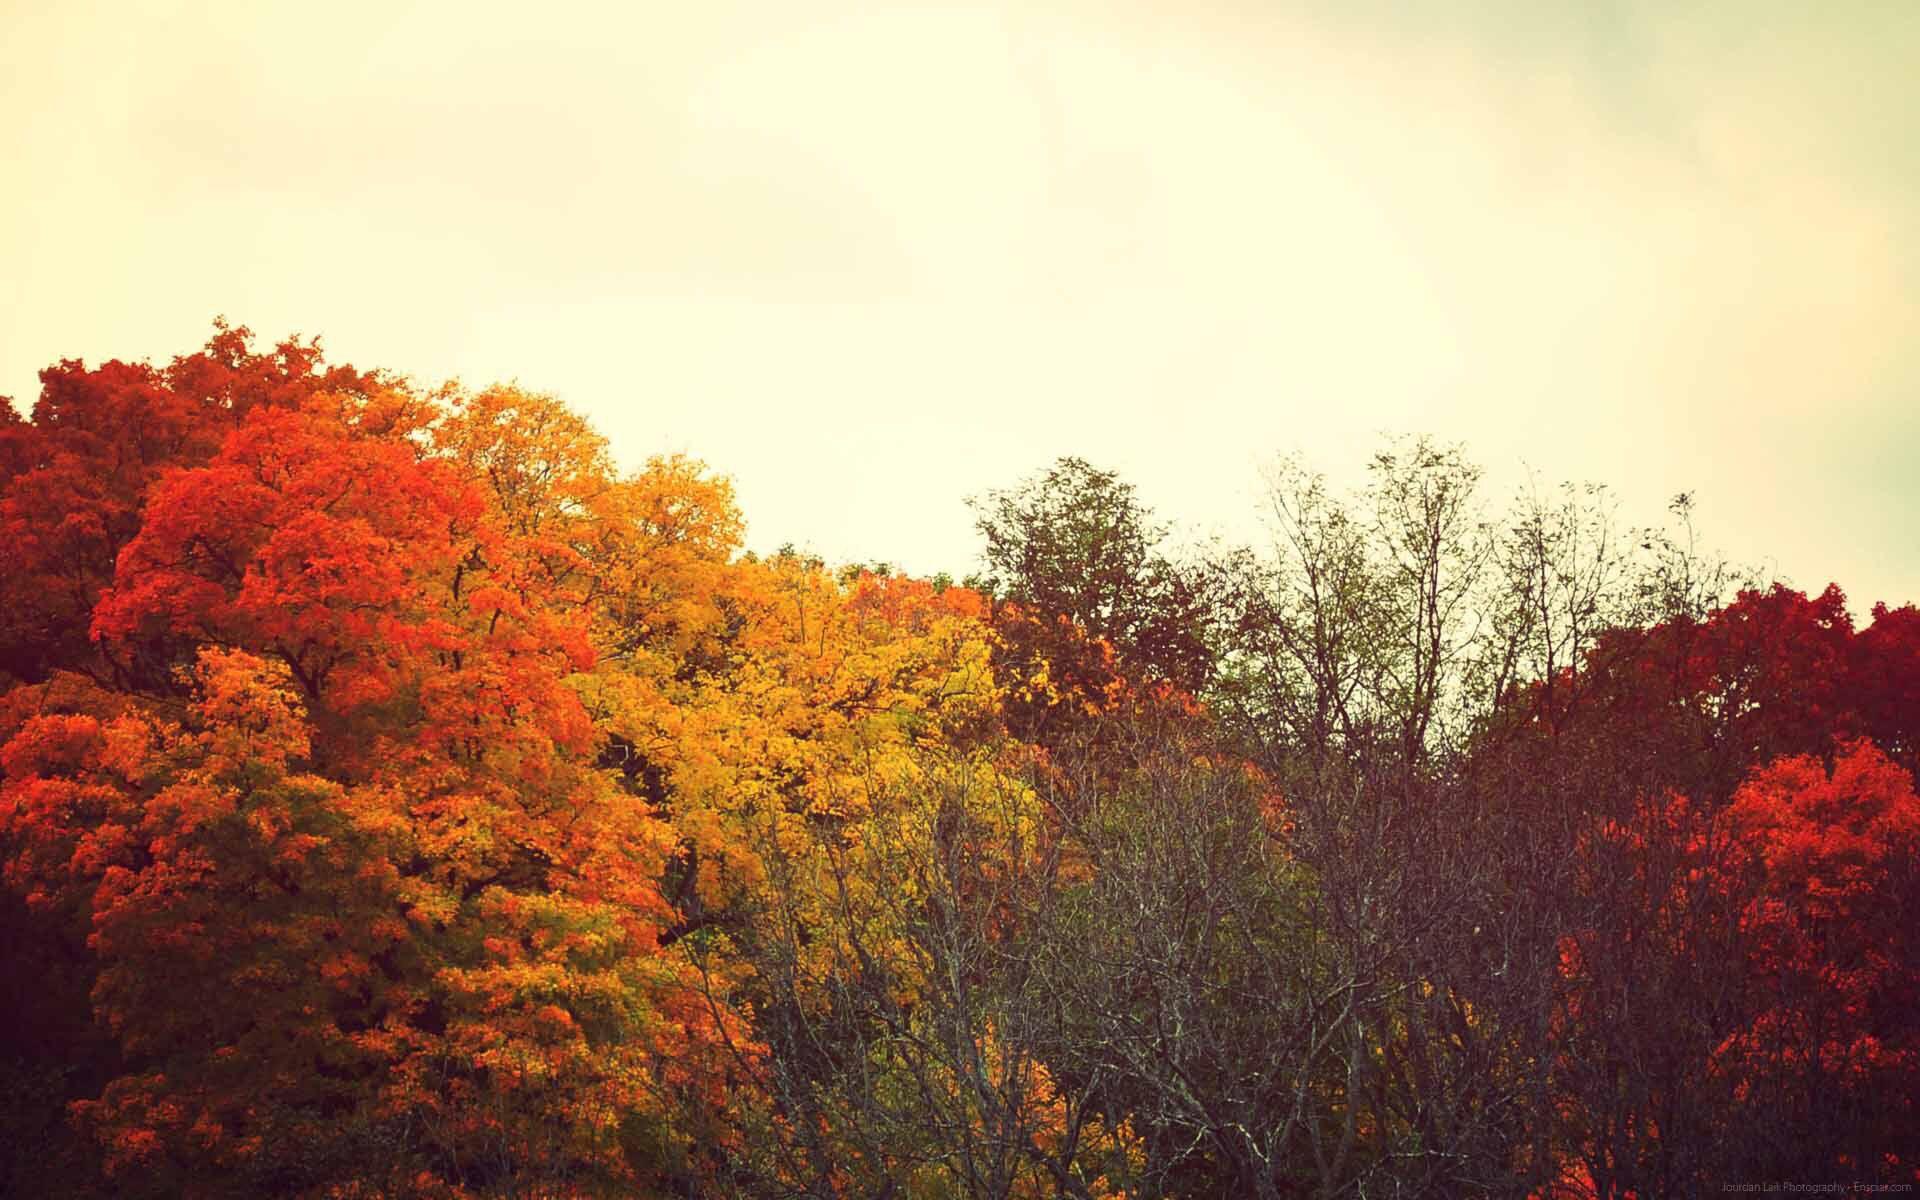 Pin By Pinterest Obsessed On Fall Autumn Tumblr Desktop Wallpaper Fall Fall Tumblr